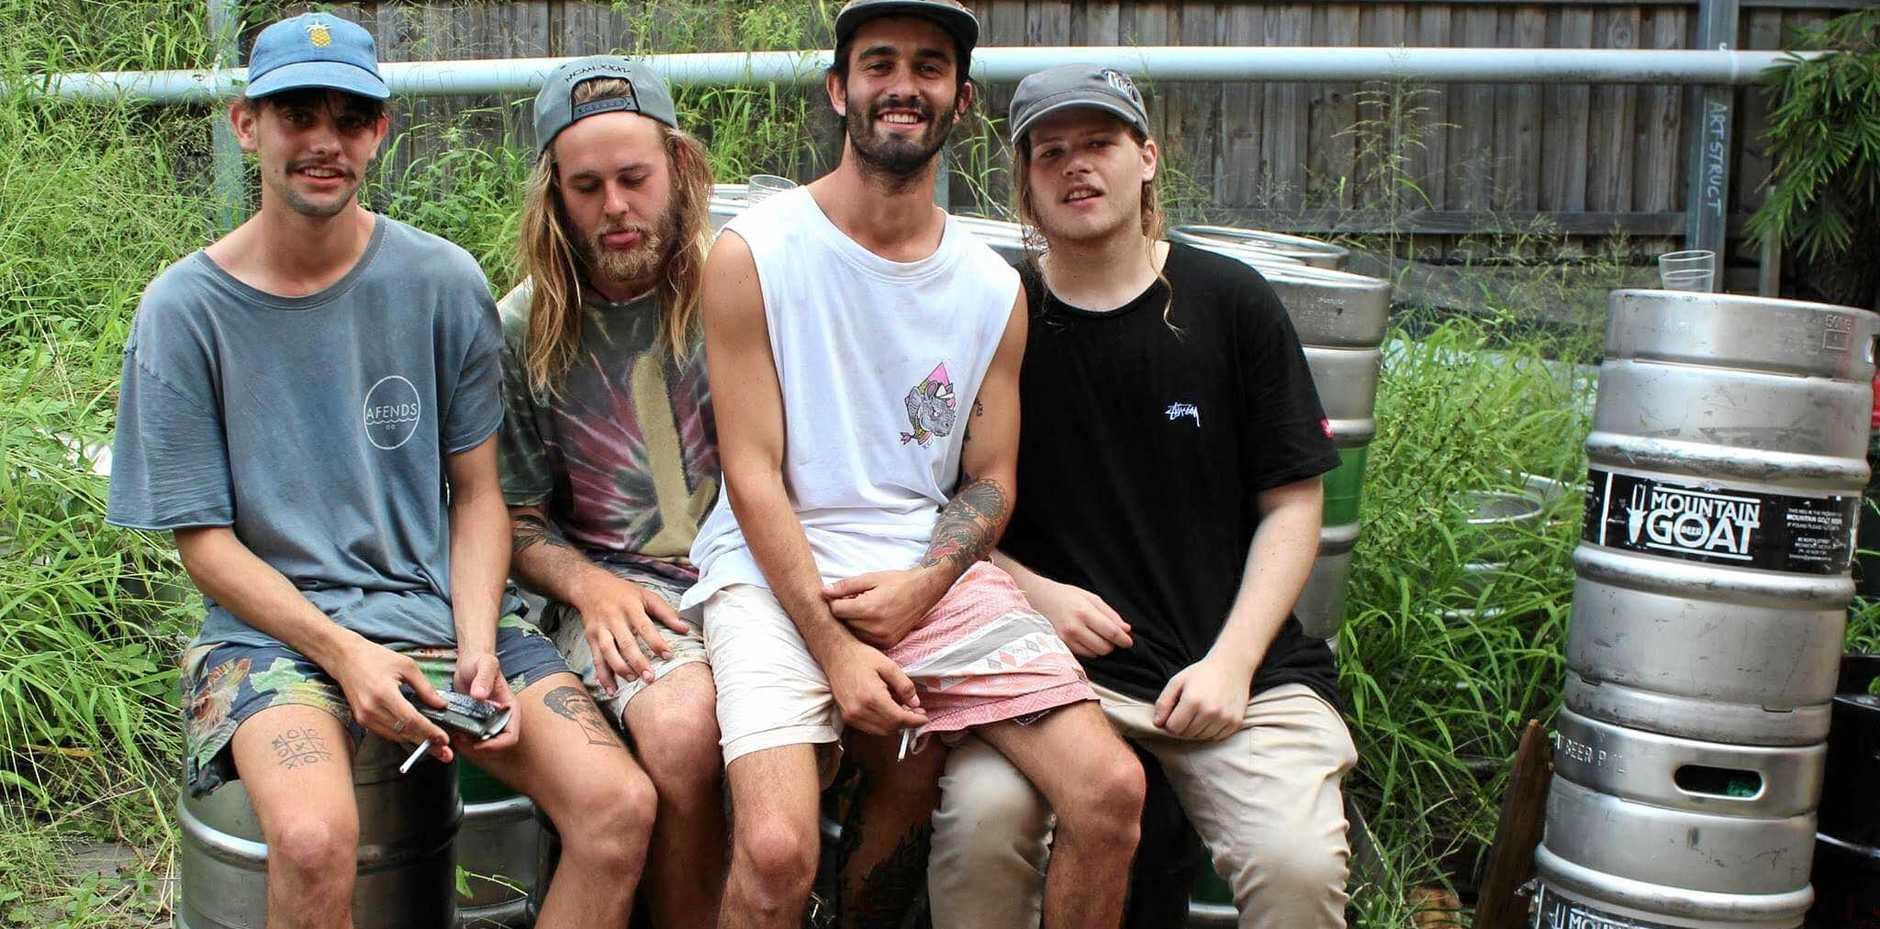 SCHOOL MATES: Rhys Adams, Lyle Hardy, Joe Scriha, Rangi Barnes make up the band Pandamic.